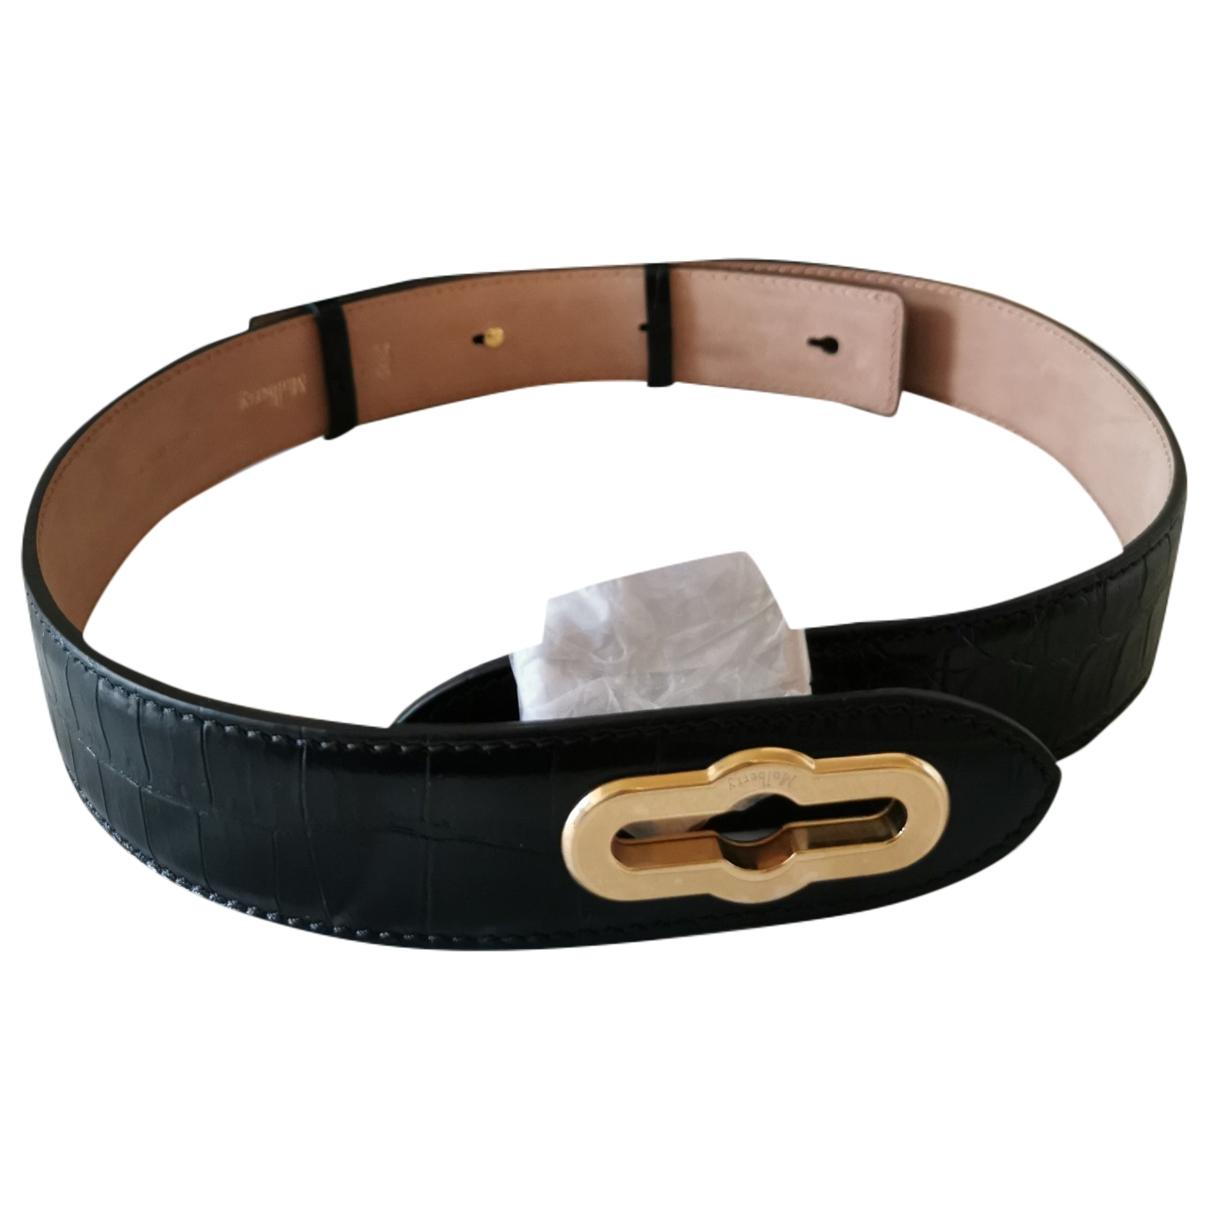 Mulberry \N Black Leather belt for Women M International